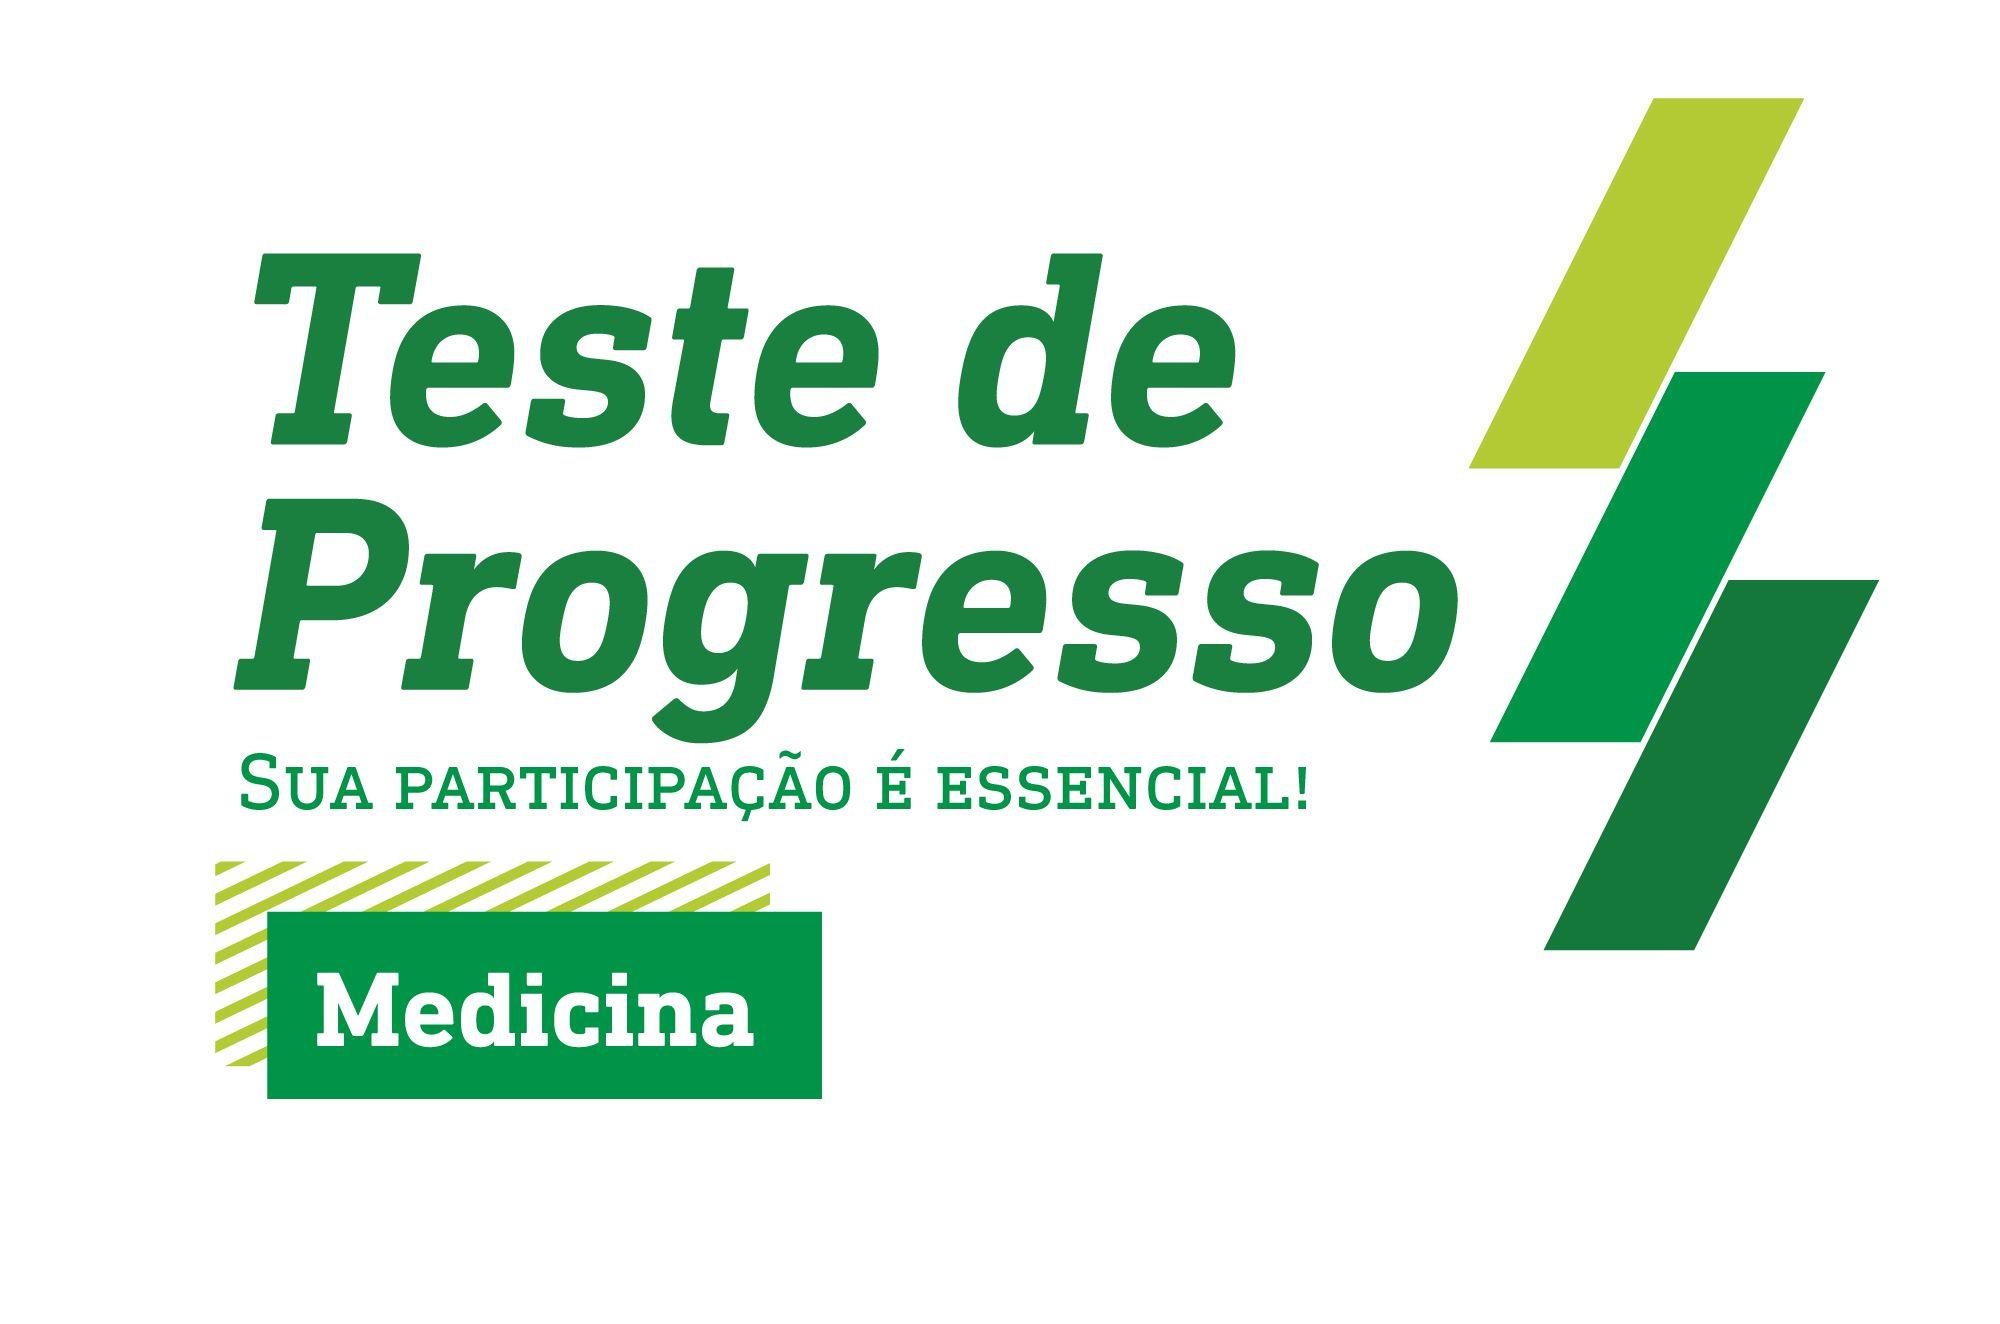 Teste de Progresso 2020.1 - Medicina